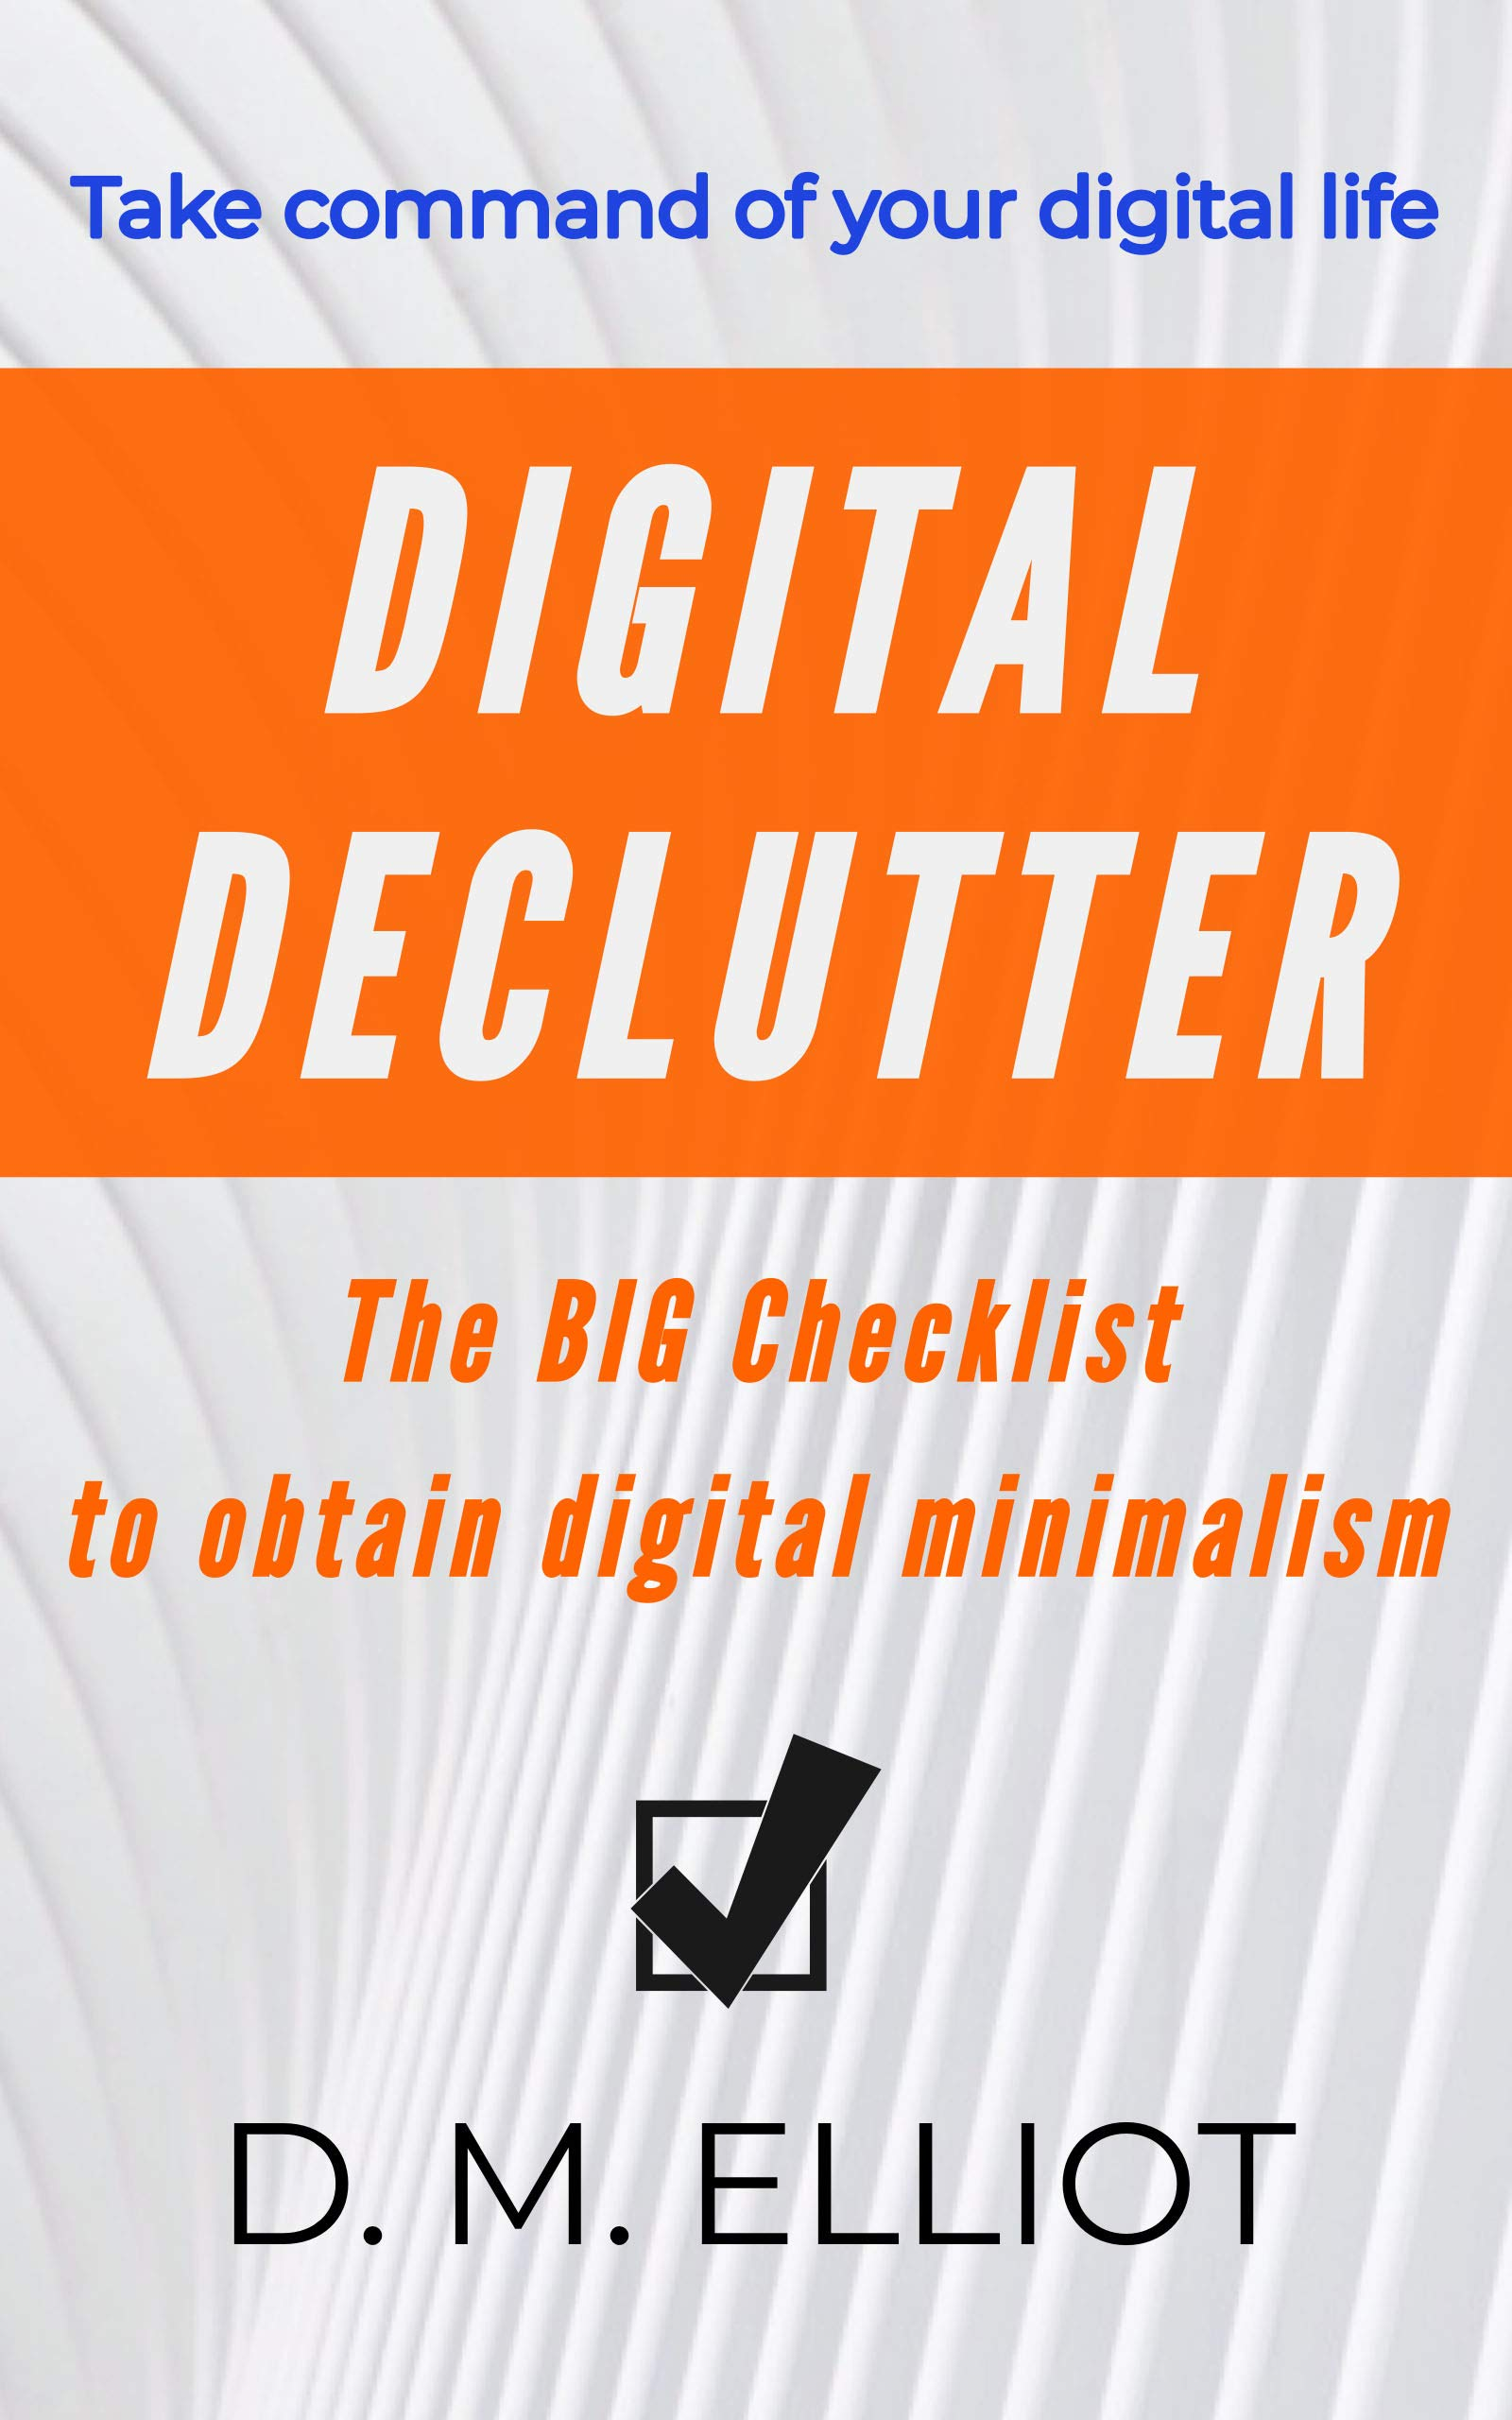 Digital Declutter: The BIG Checklist to obtain digital minimalism